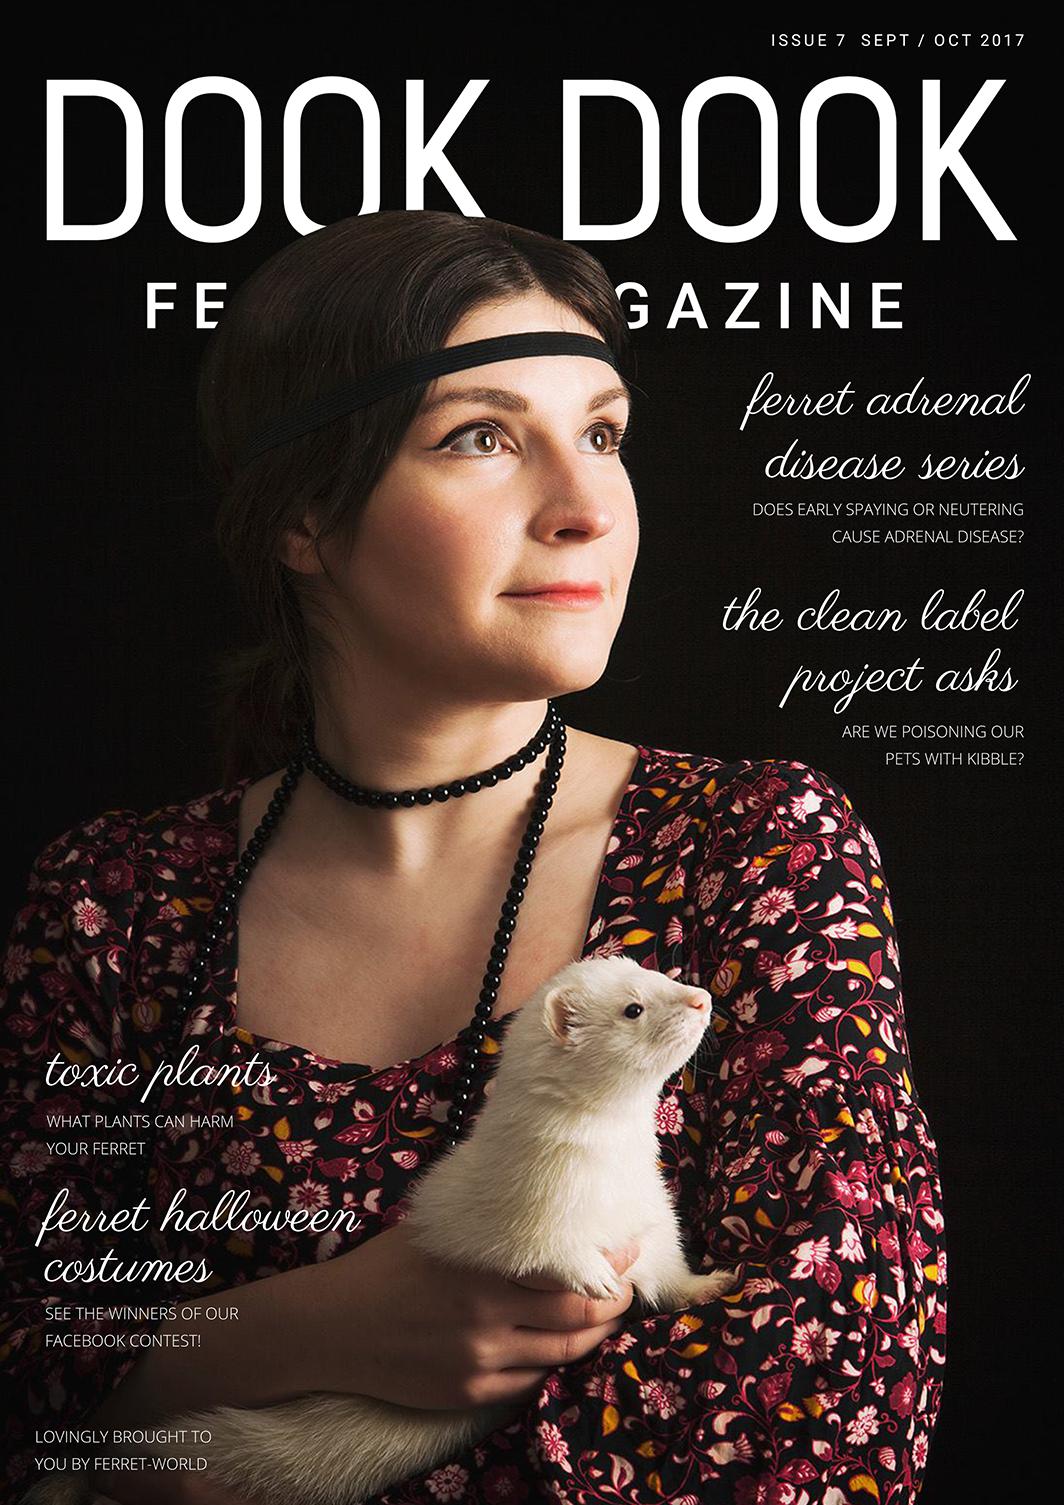 Dook Dook Ferret Magazine Issue 7